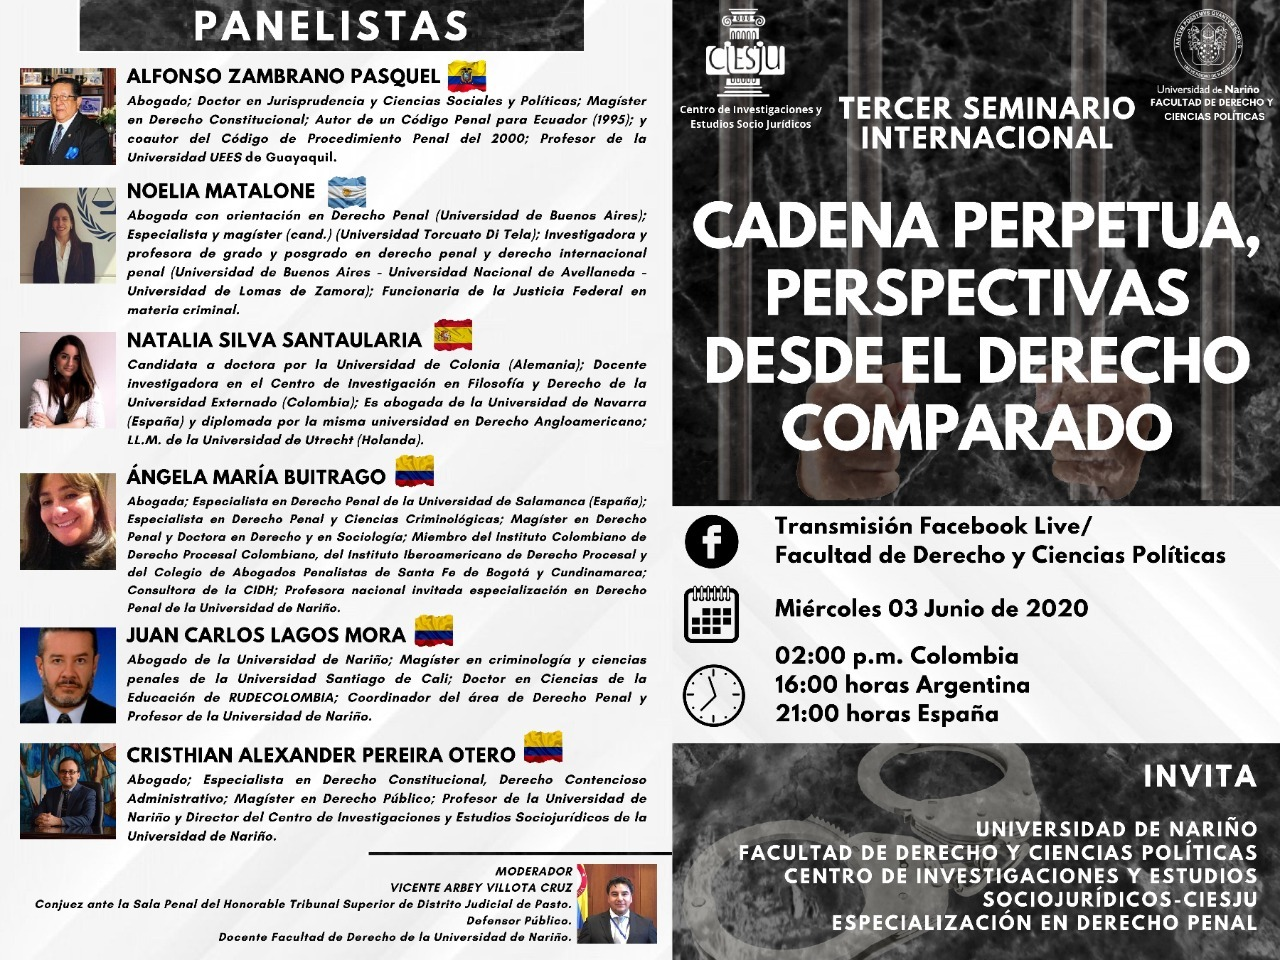 3-seminario-internacional